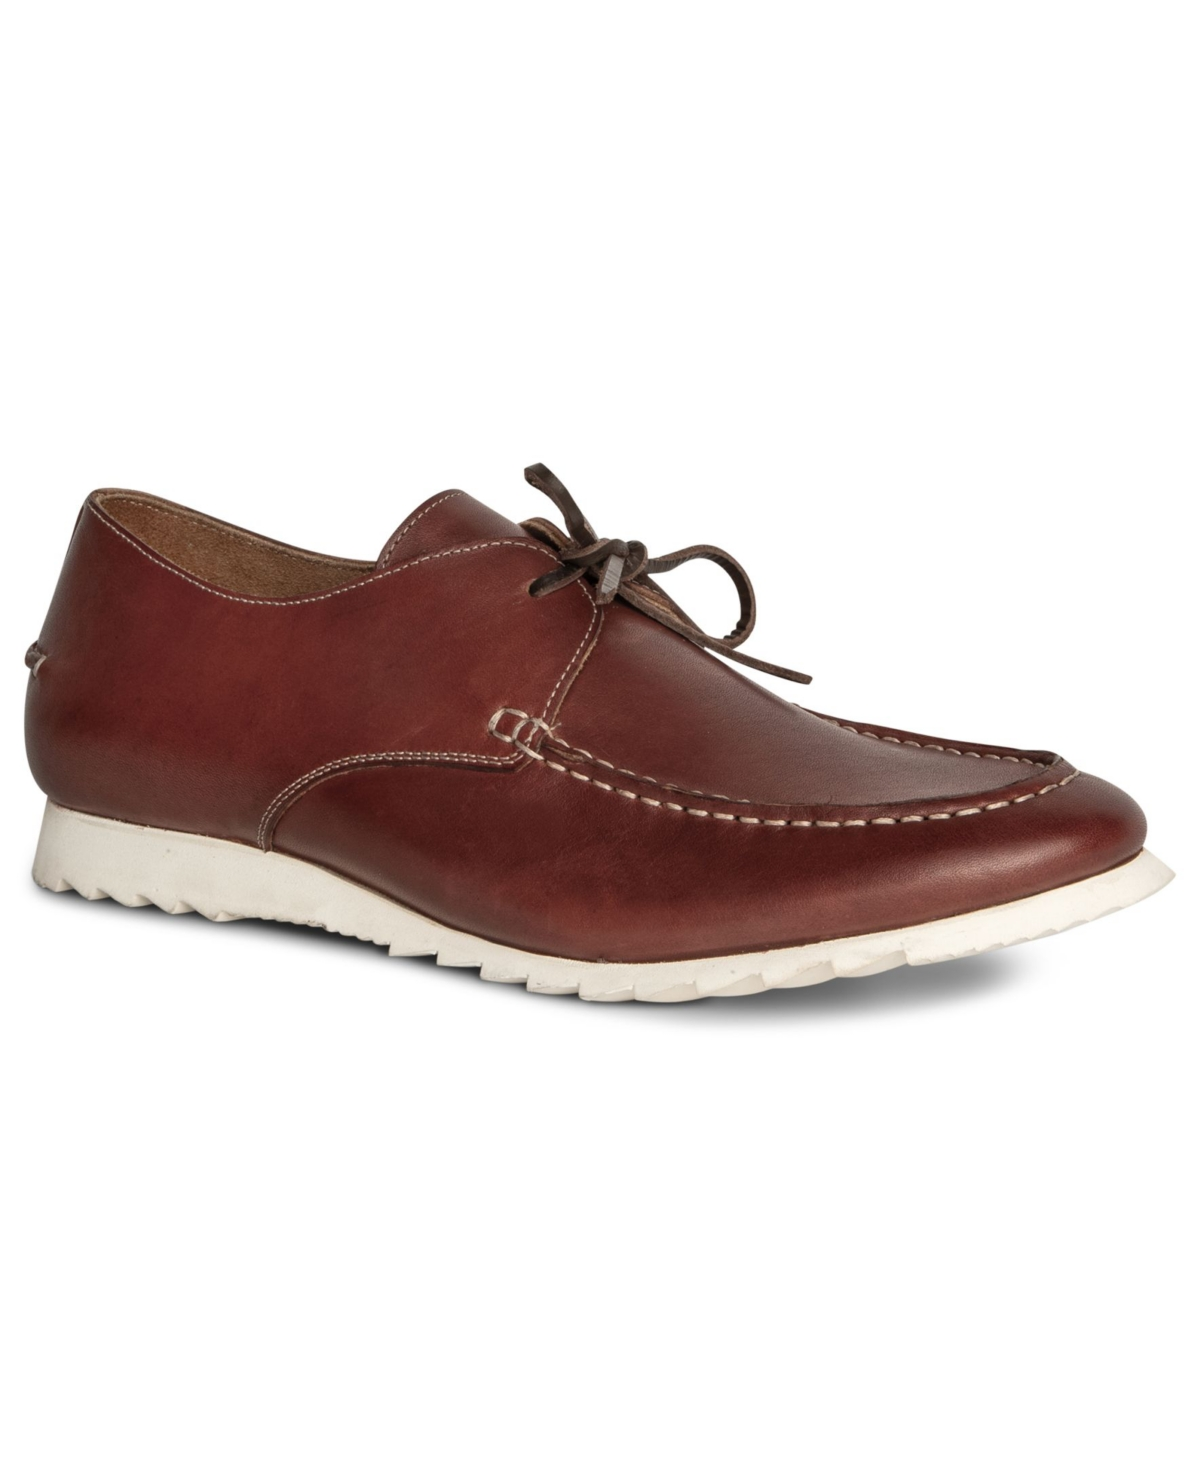 Carlos by Carlos Santana Hendrix Moccasins Men's Lace-Up Casual Shoe Men's Shoes